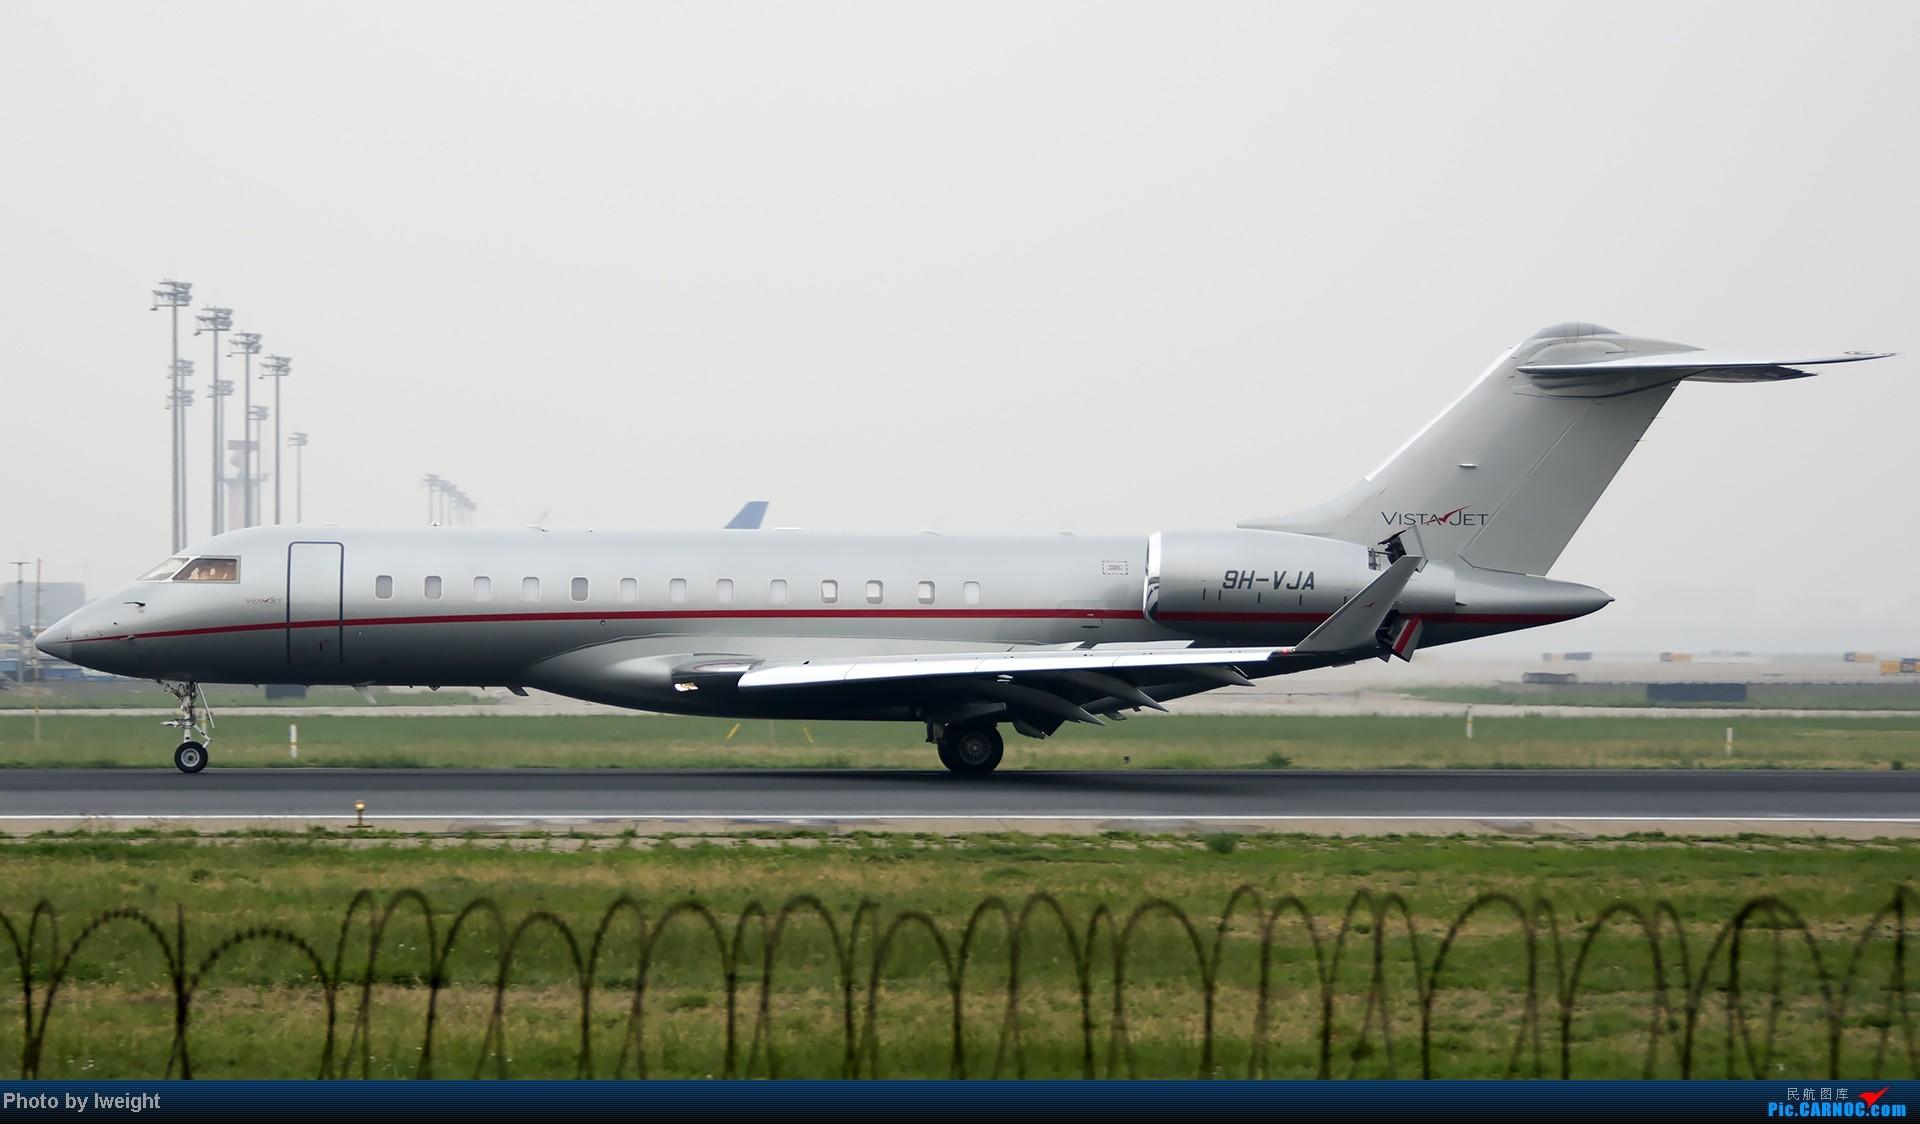 Re:[原创]休假无聊,跑道边来拍机玩(晚点的ZestAir、换装的B6100和刚交付的B2738等) BOMBARDIER BD-700 9H-VJA 中国北京首都机场